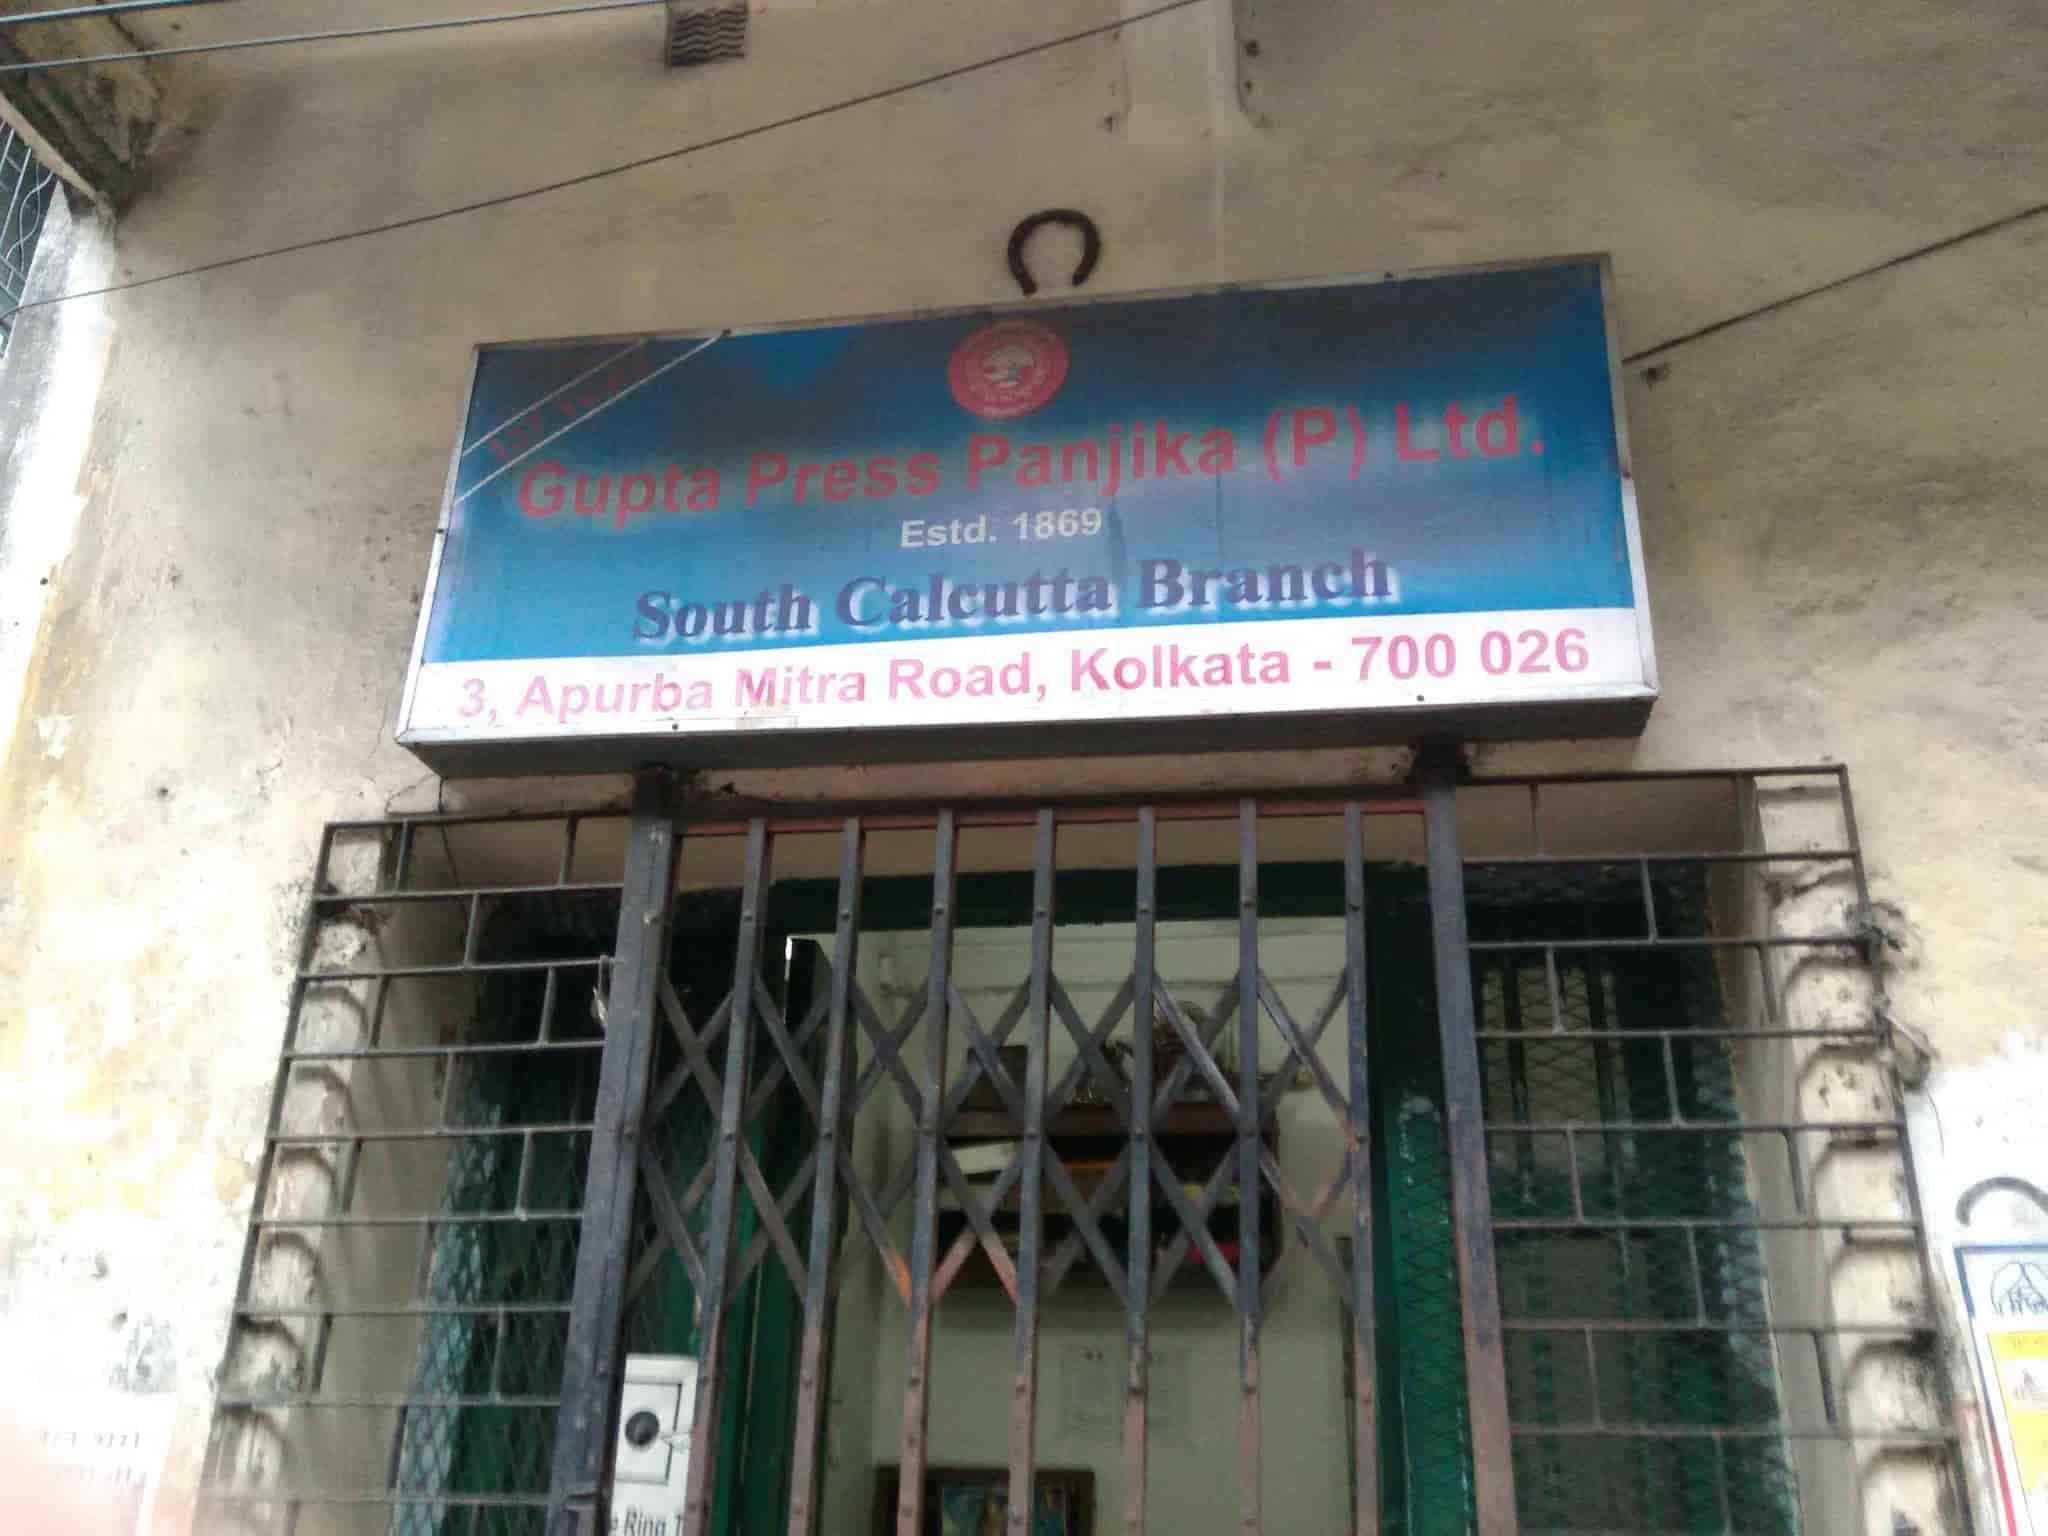 Gupta Press Panjika Pvt Ltd, Kalighat - Astrologers in